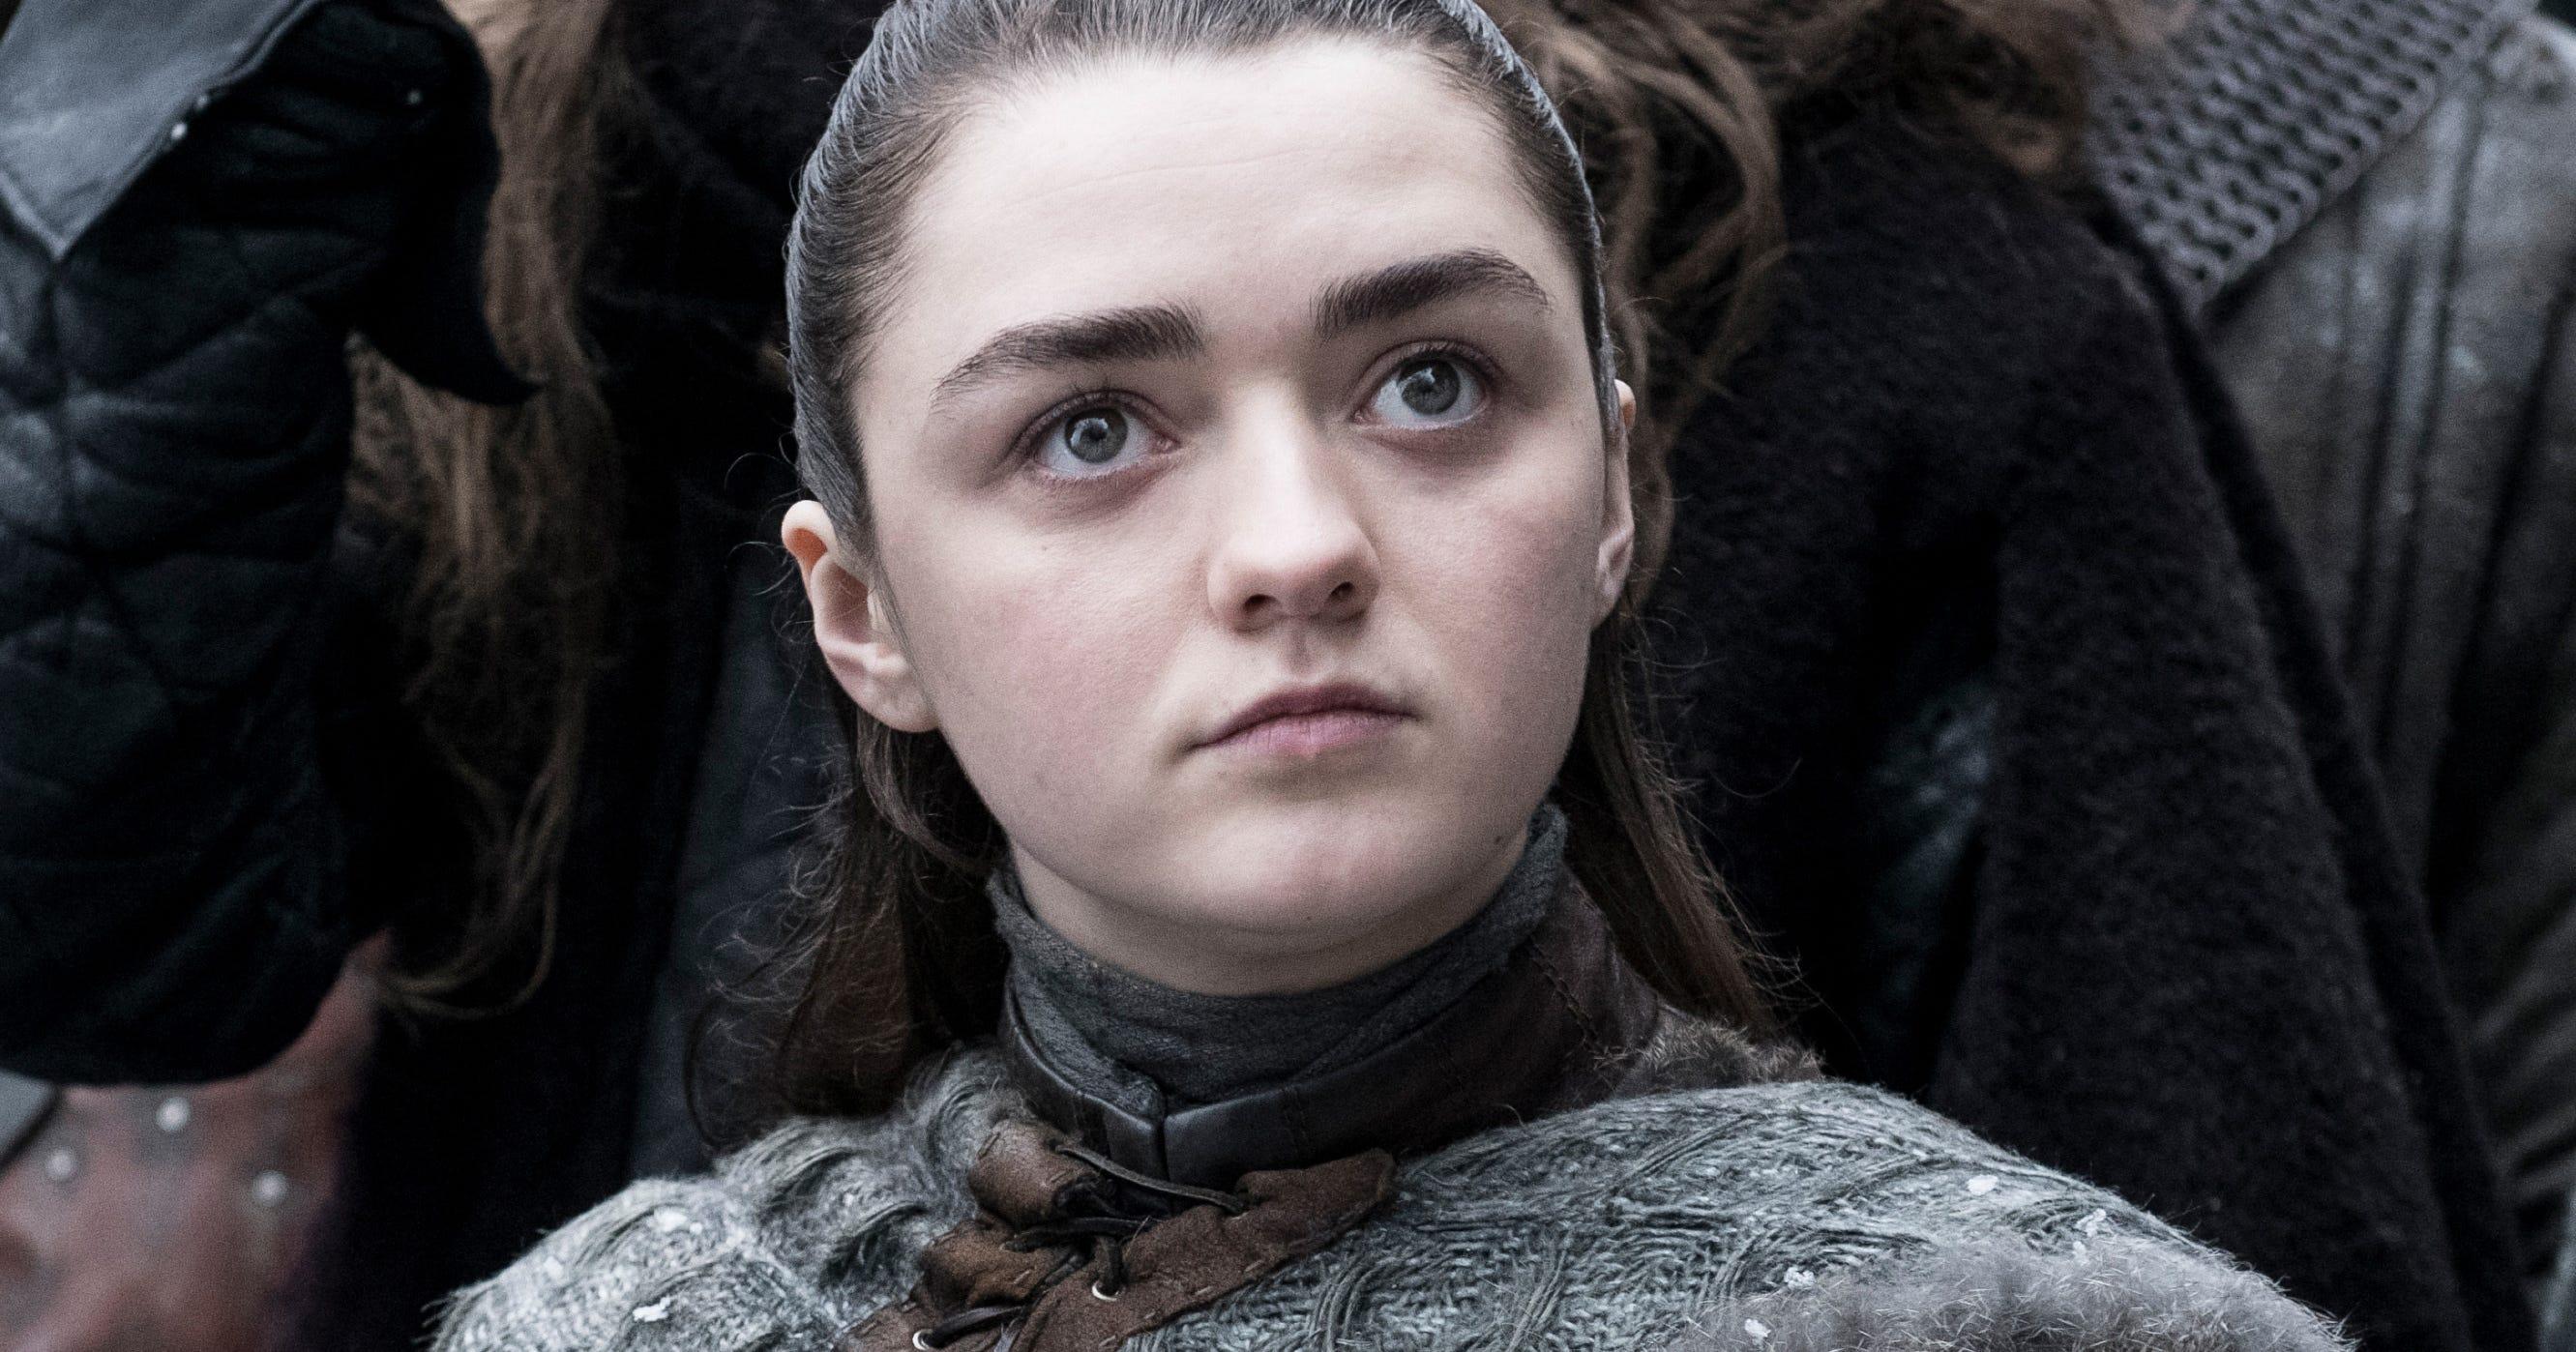 Arya Stark GOT Winterfell Kill Explained, How It Worked